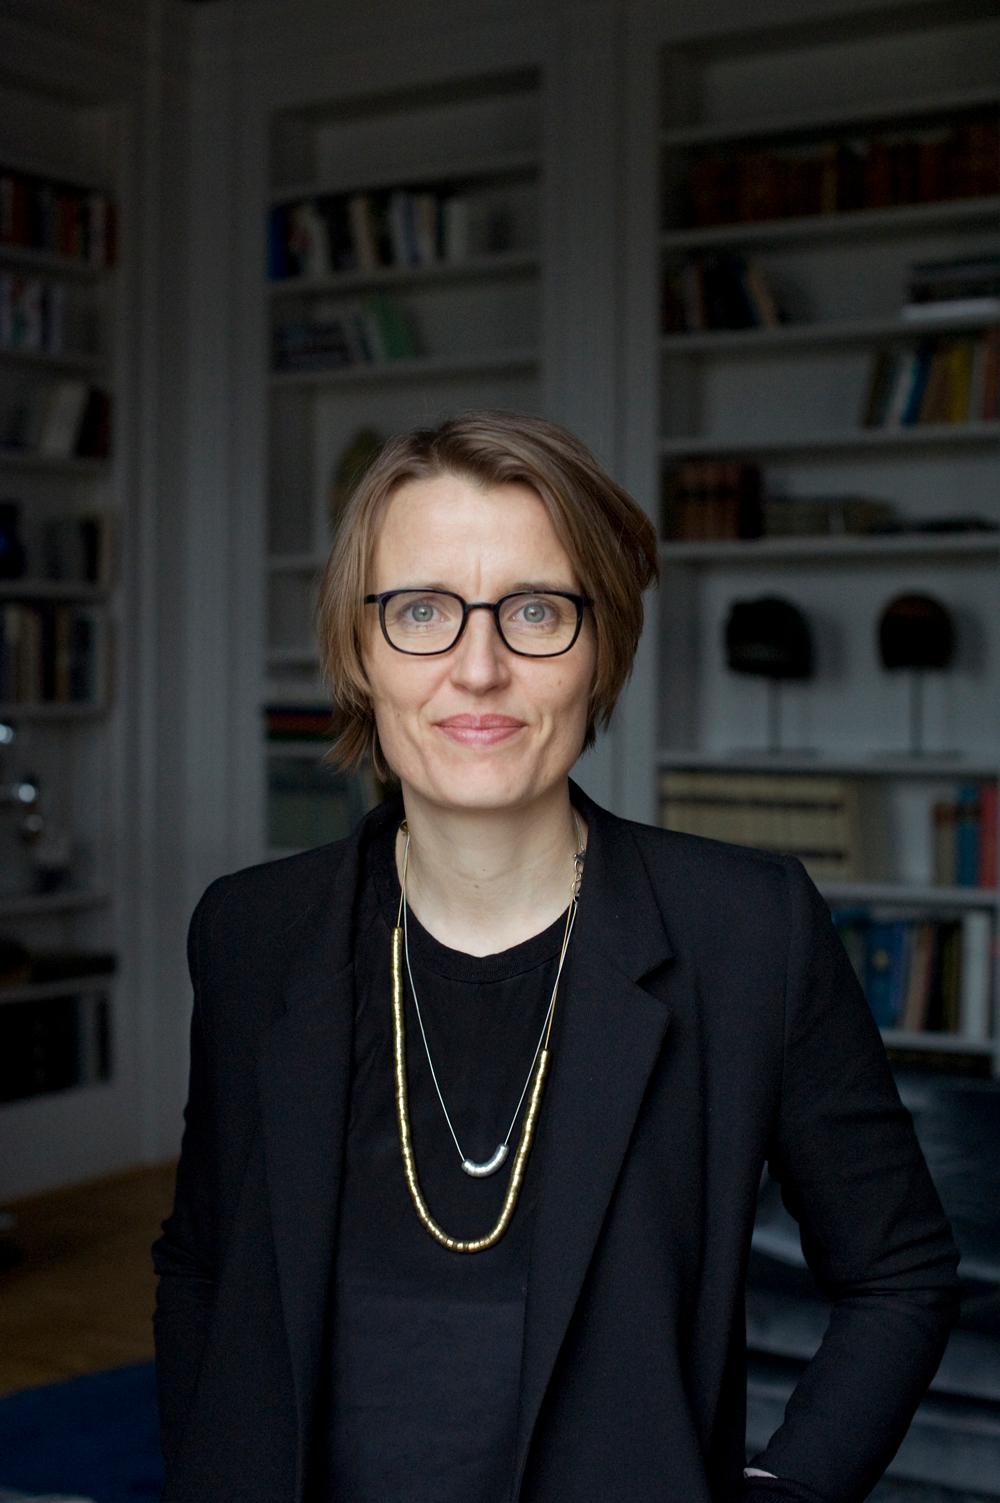 Swantje Karich, Blau Magazine